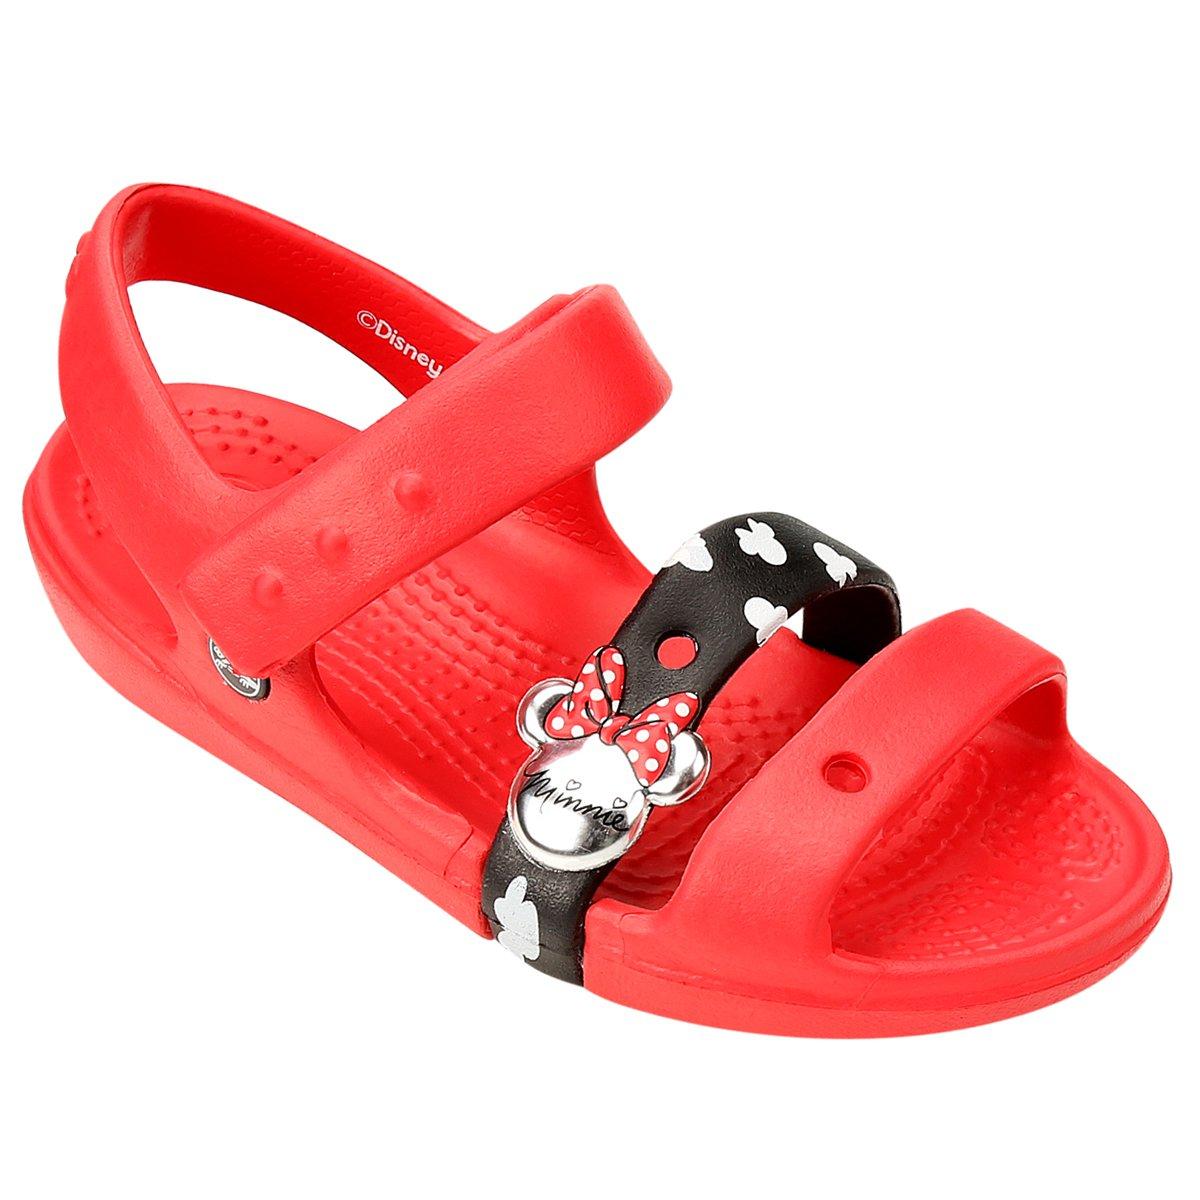 Crocs Keeley Sandália MouseNetshoes Sandal Infantil Minnie 5uT1clKJF3